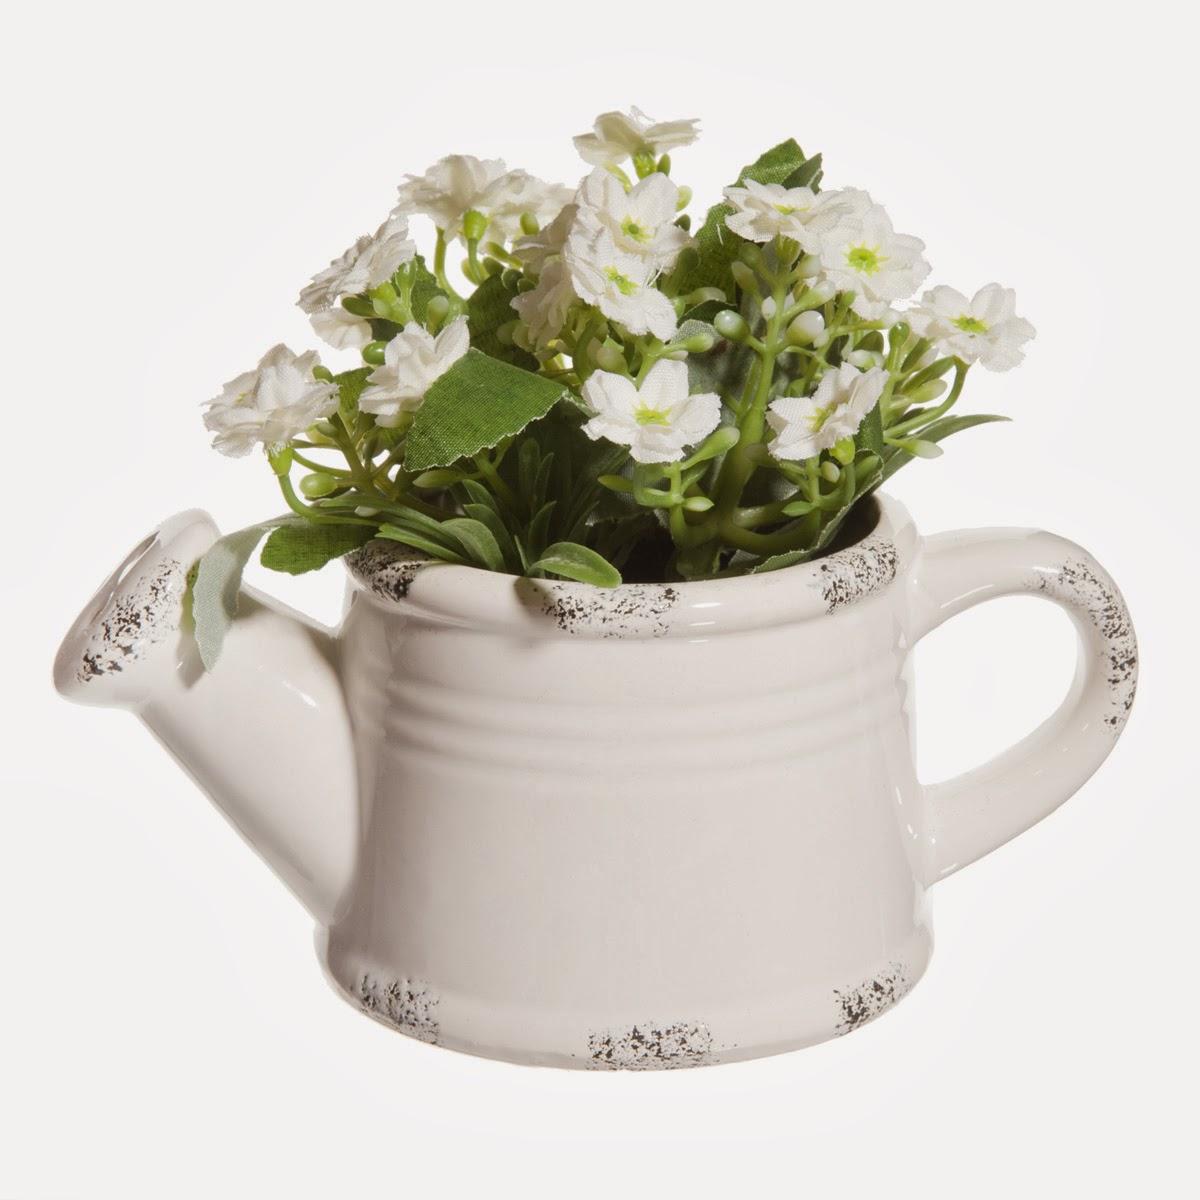 http://www.maisonsdumonde.com/IT/it/produits/fiche/innaffiatoio-fiori-bianchi-138967.htm